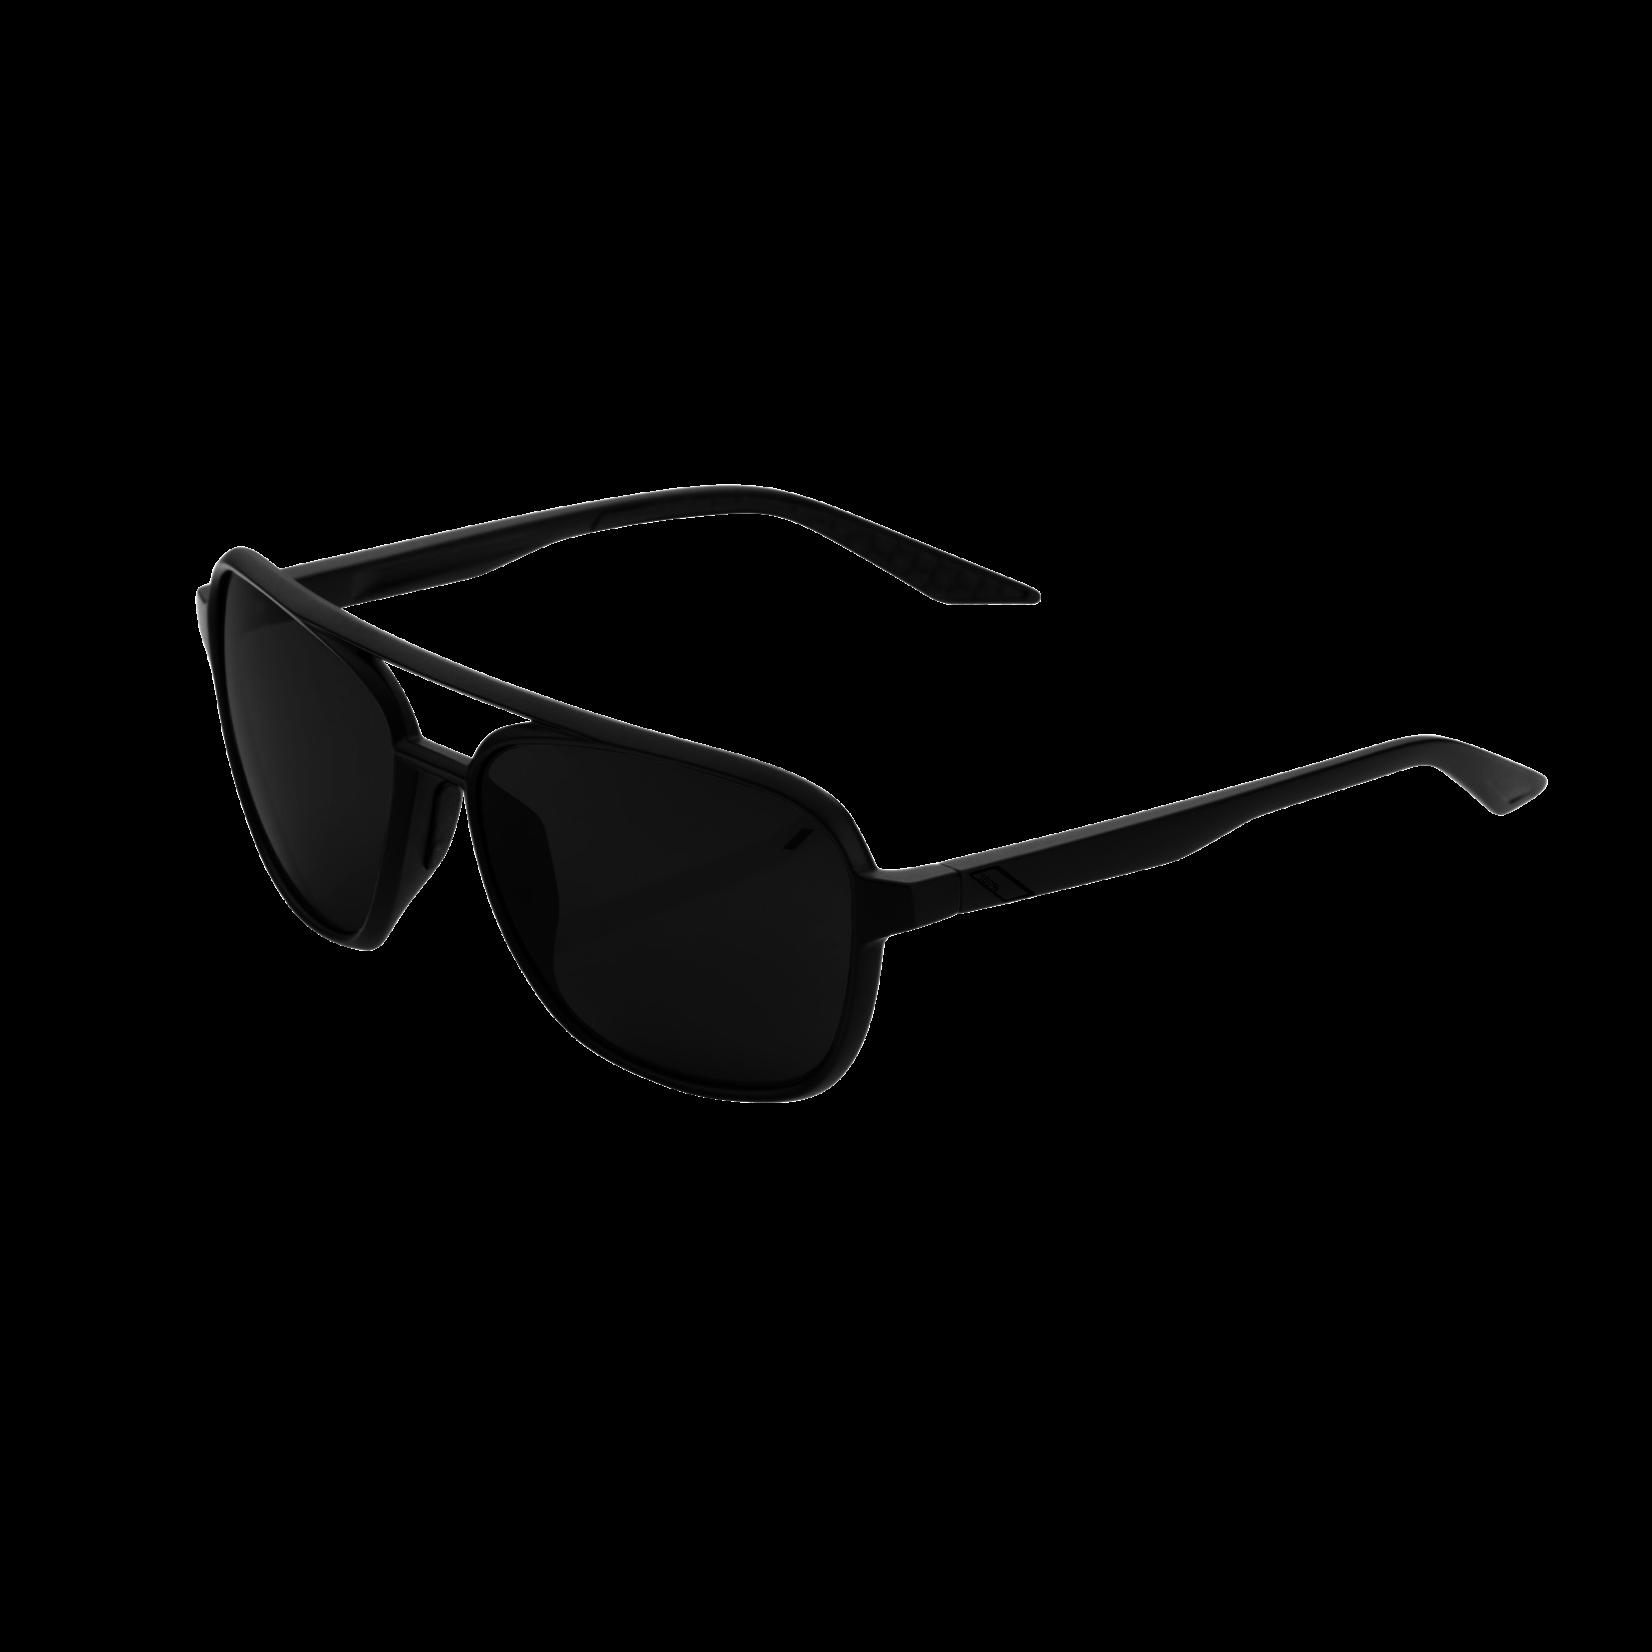 100 Percent 100% Kasia Sunglasses